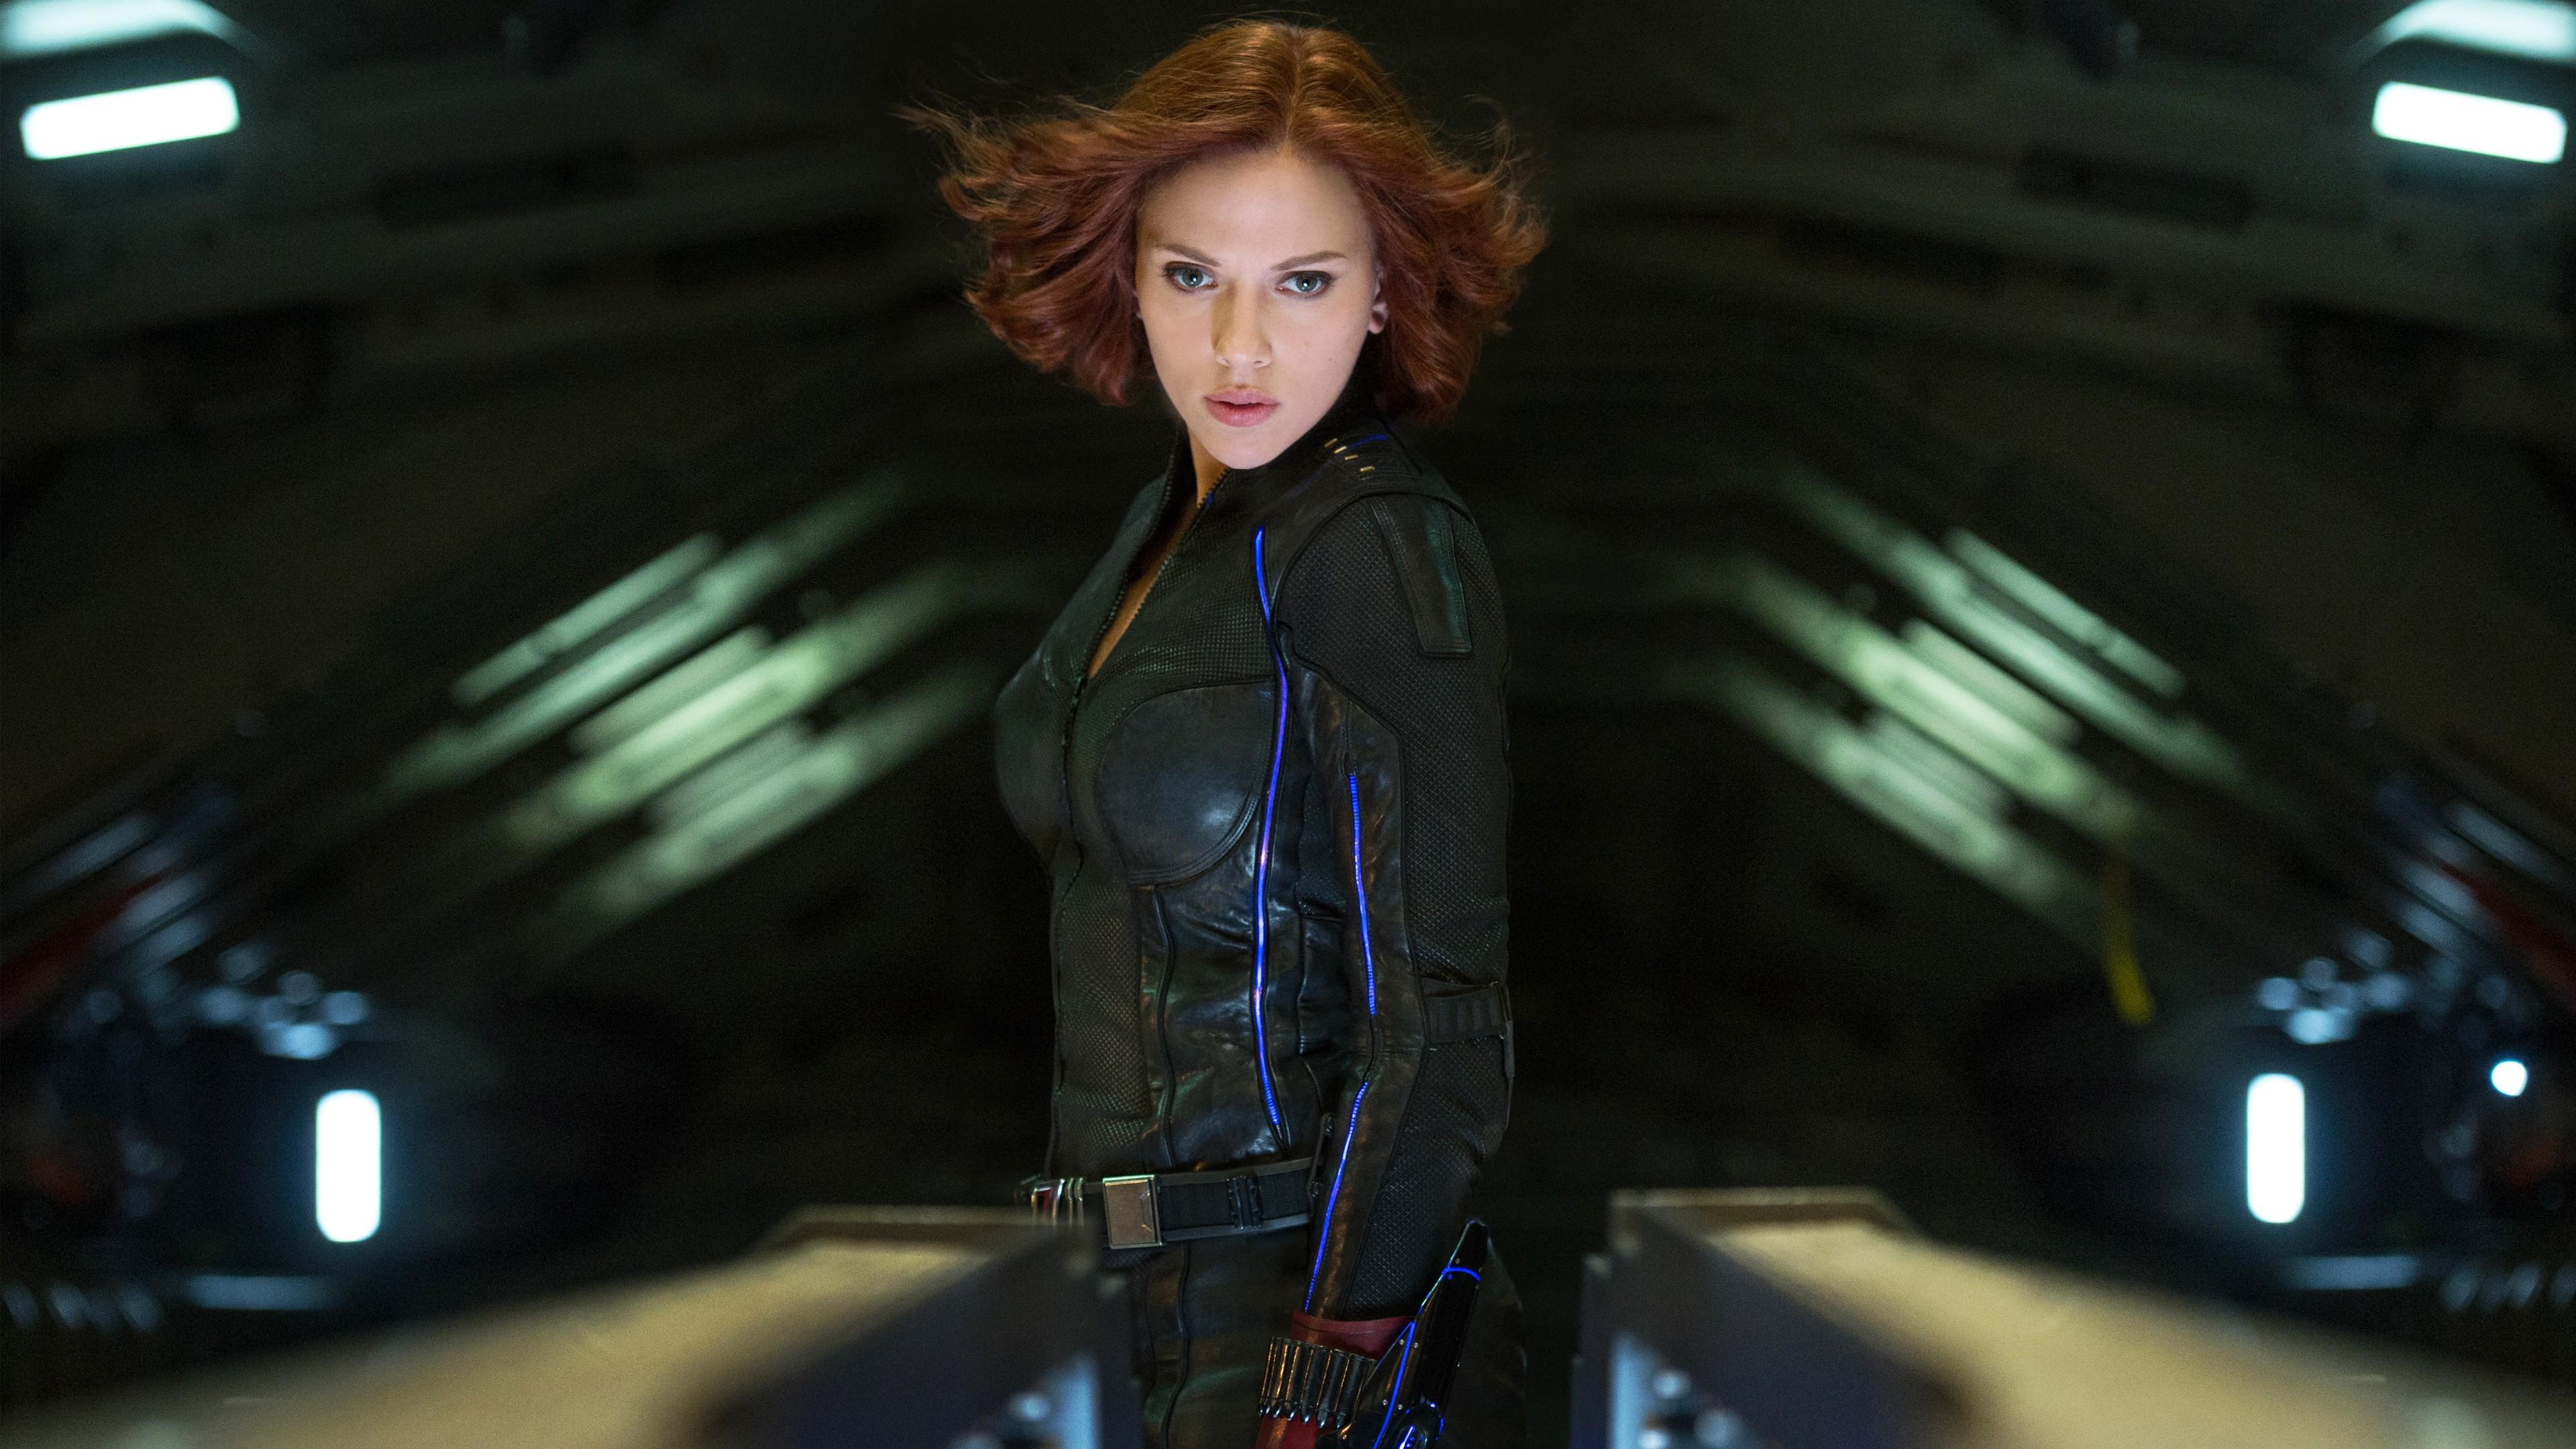 1280x2120 Scarlett Johansson Avengers IPhone 6+ HD 4k